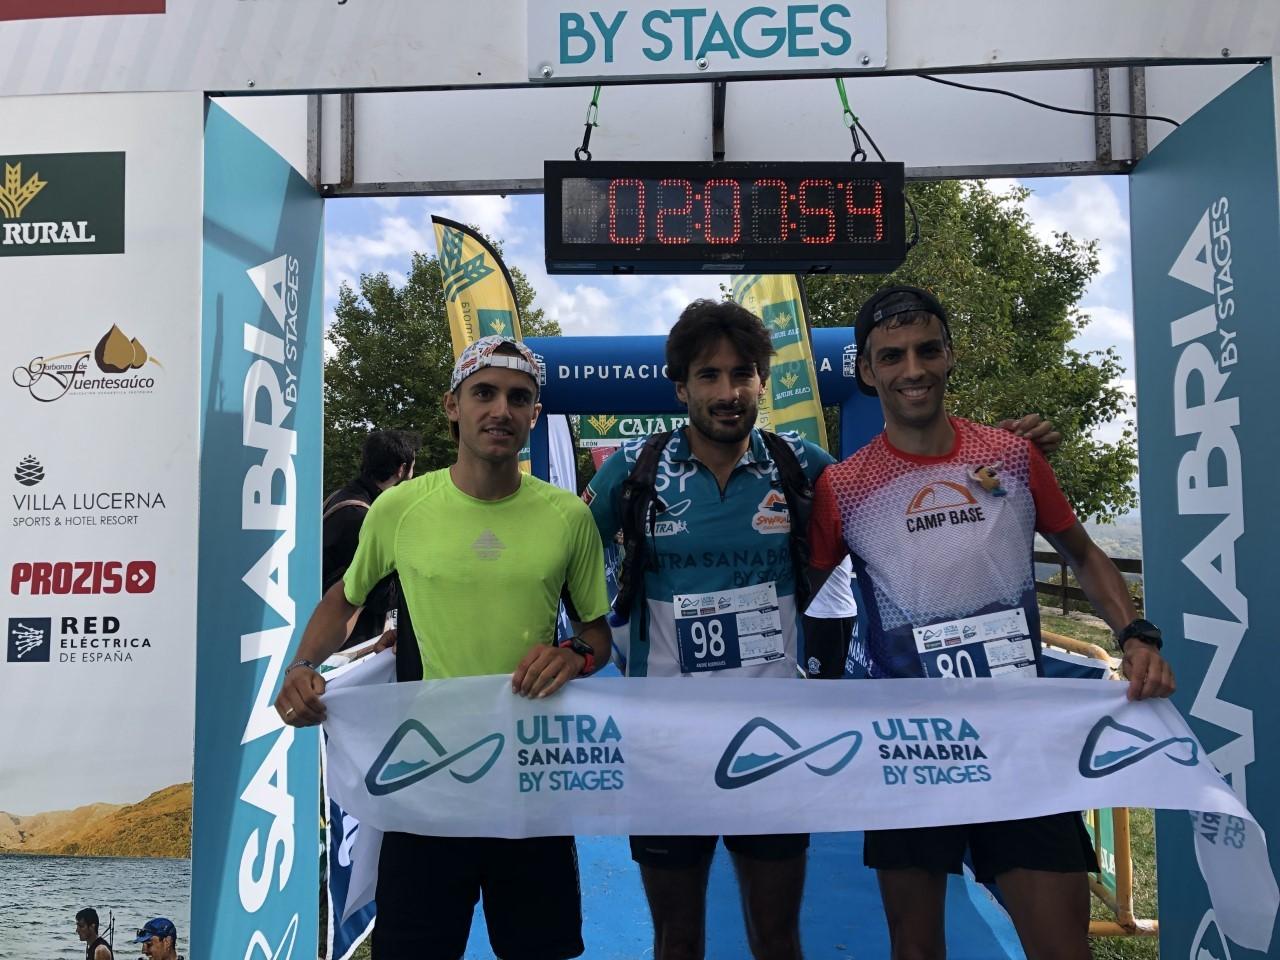 Los tres primeros del Ultra Sanabria Caja Rural.